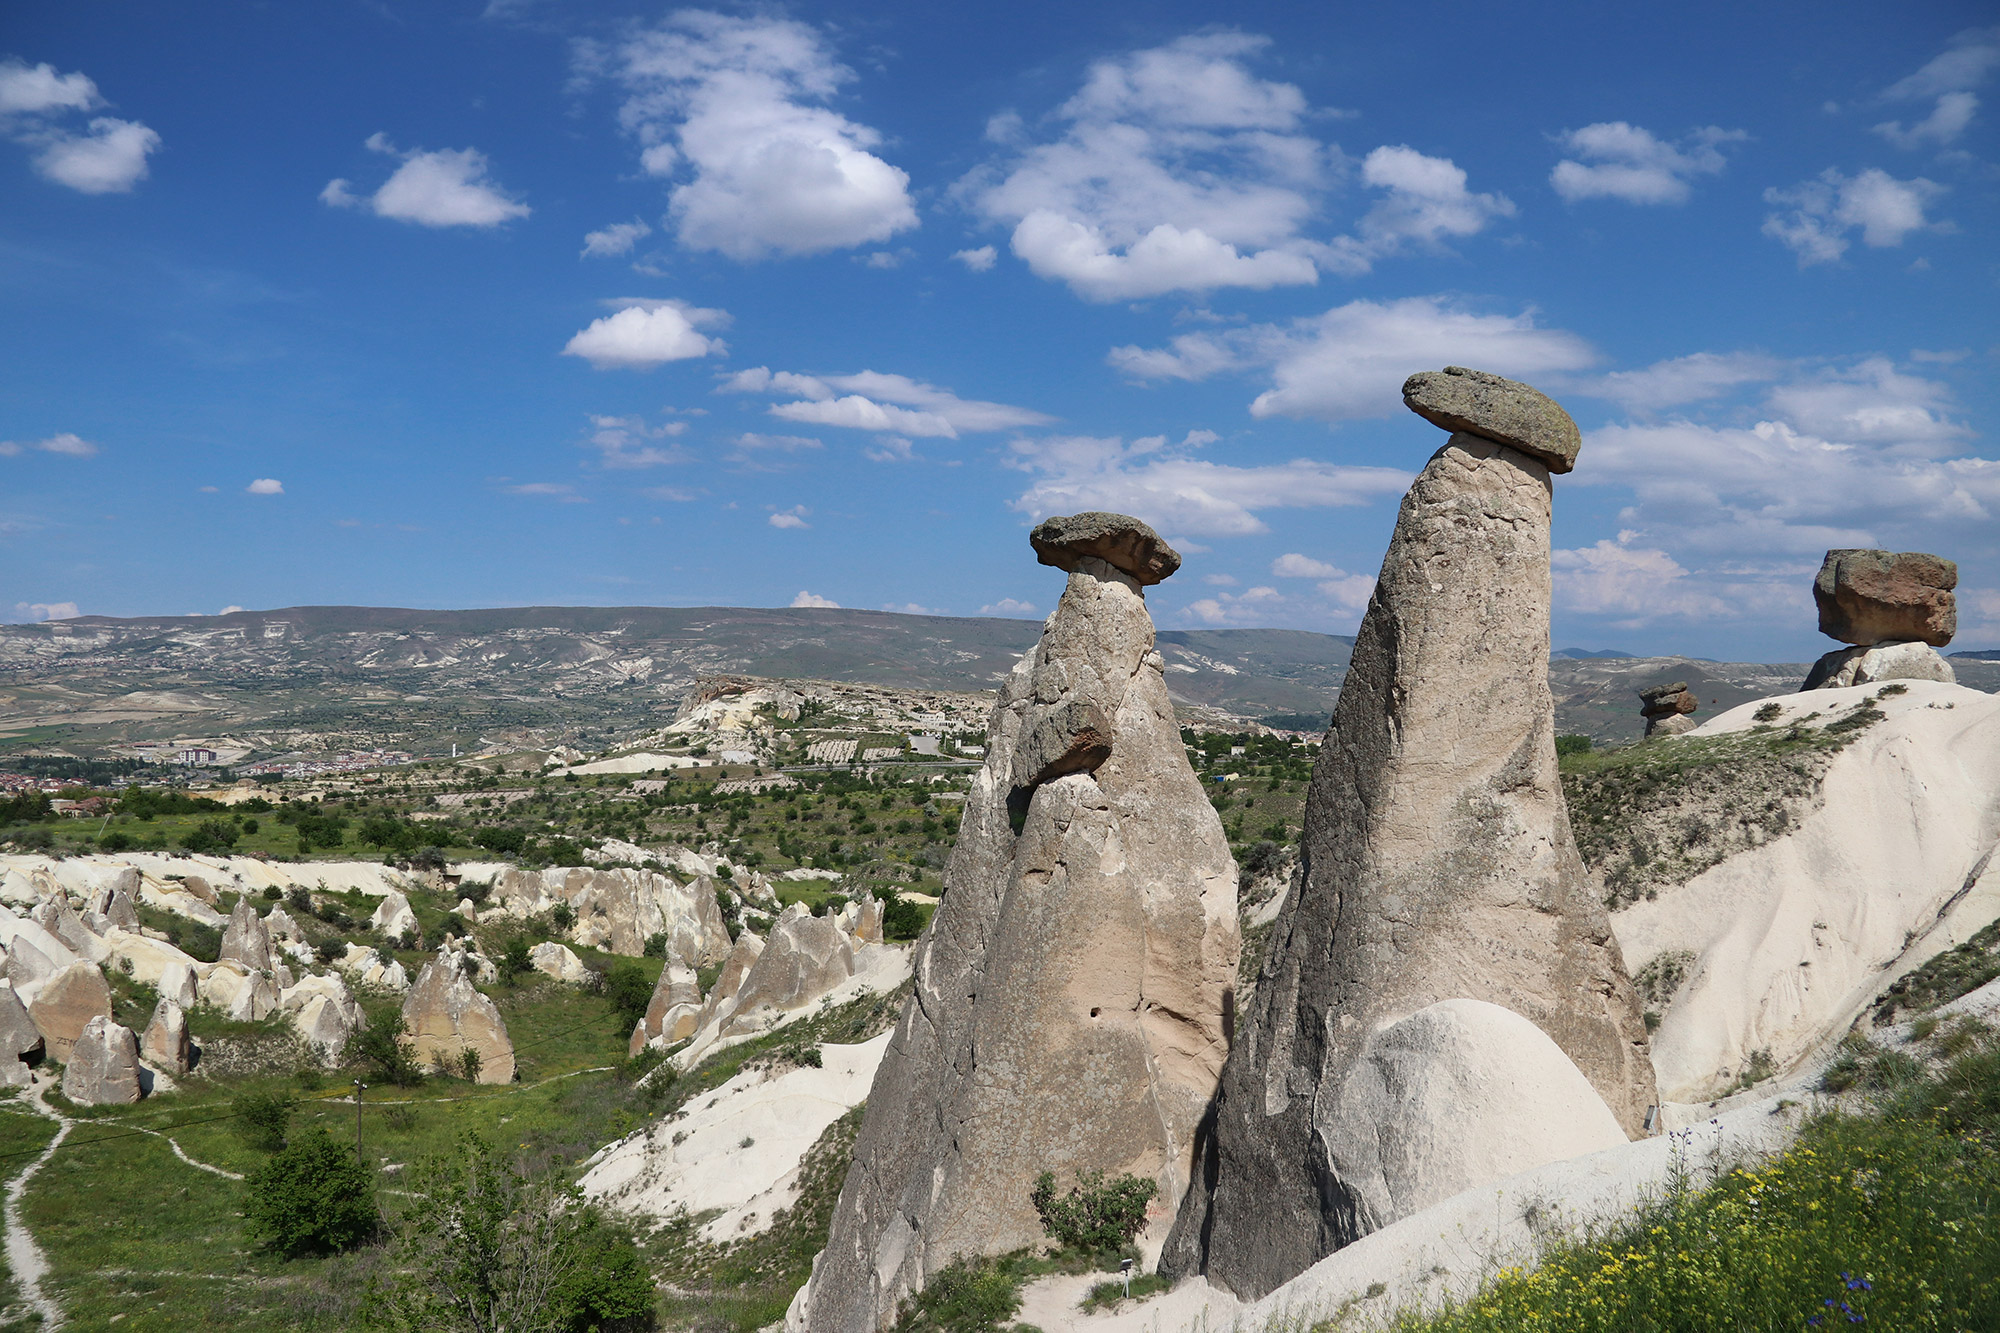 Turkije reisverslag: Terug in Cappadocië